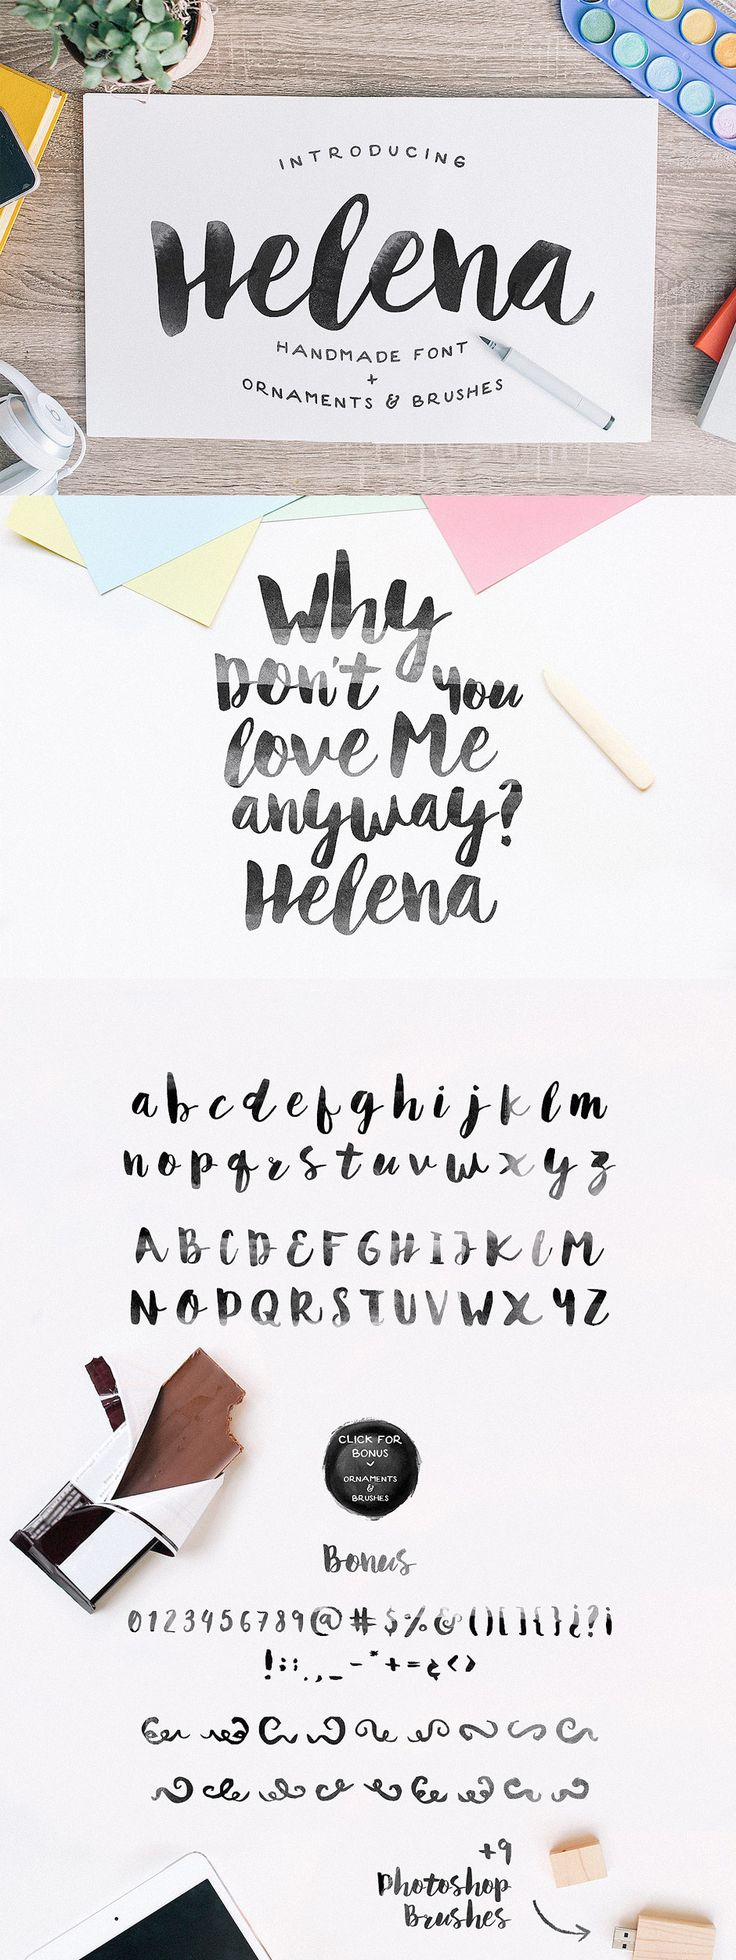 Helena Font by Noe Araujo | 22 Professional & Artistic Fonts Apr 2015